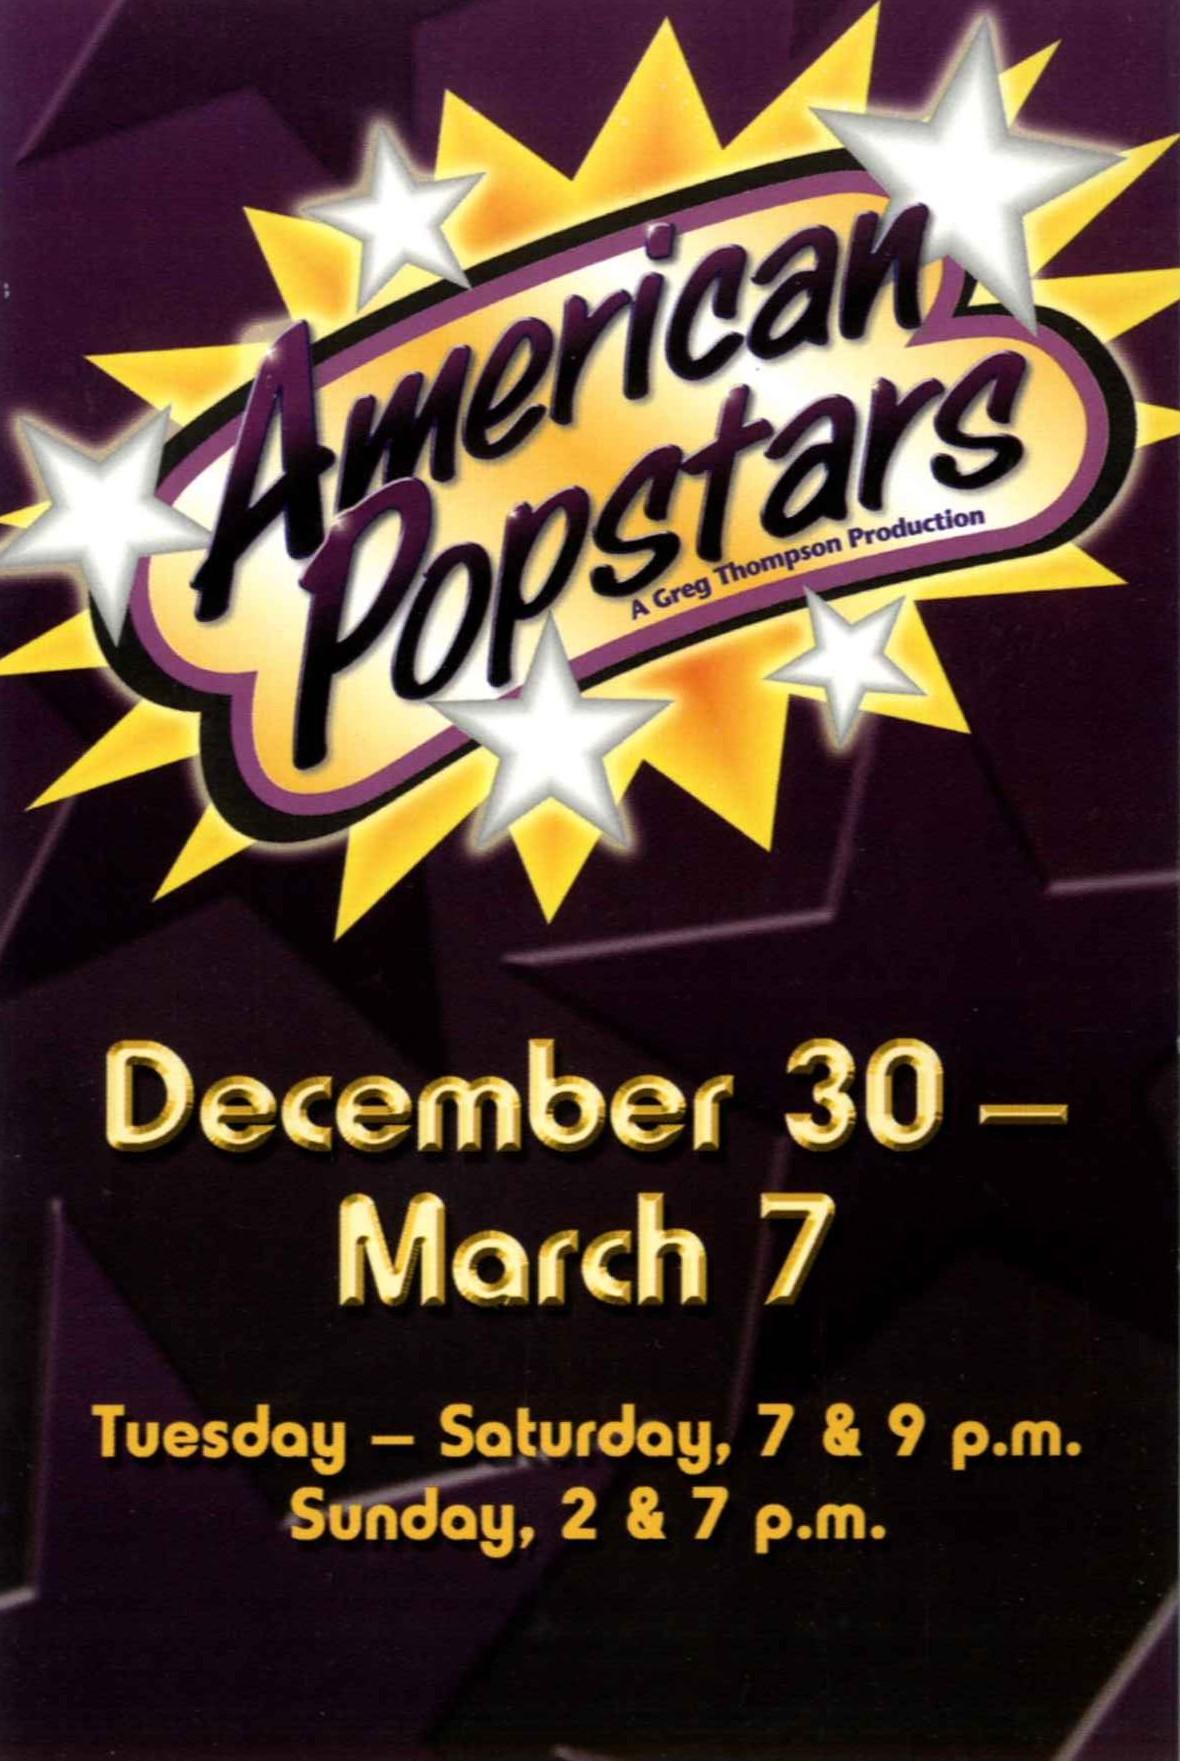 American Popstars